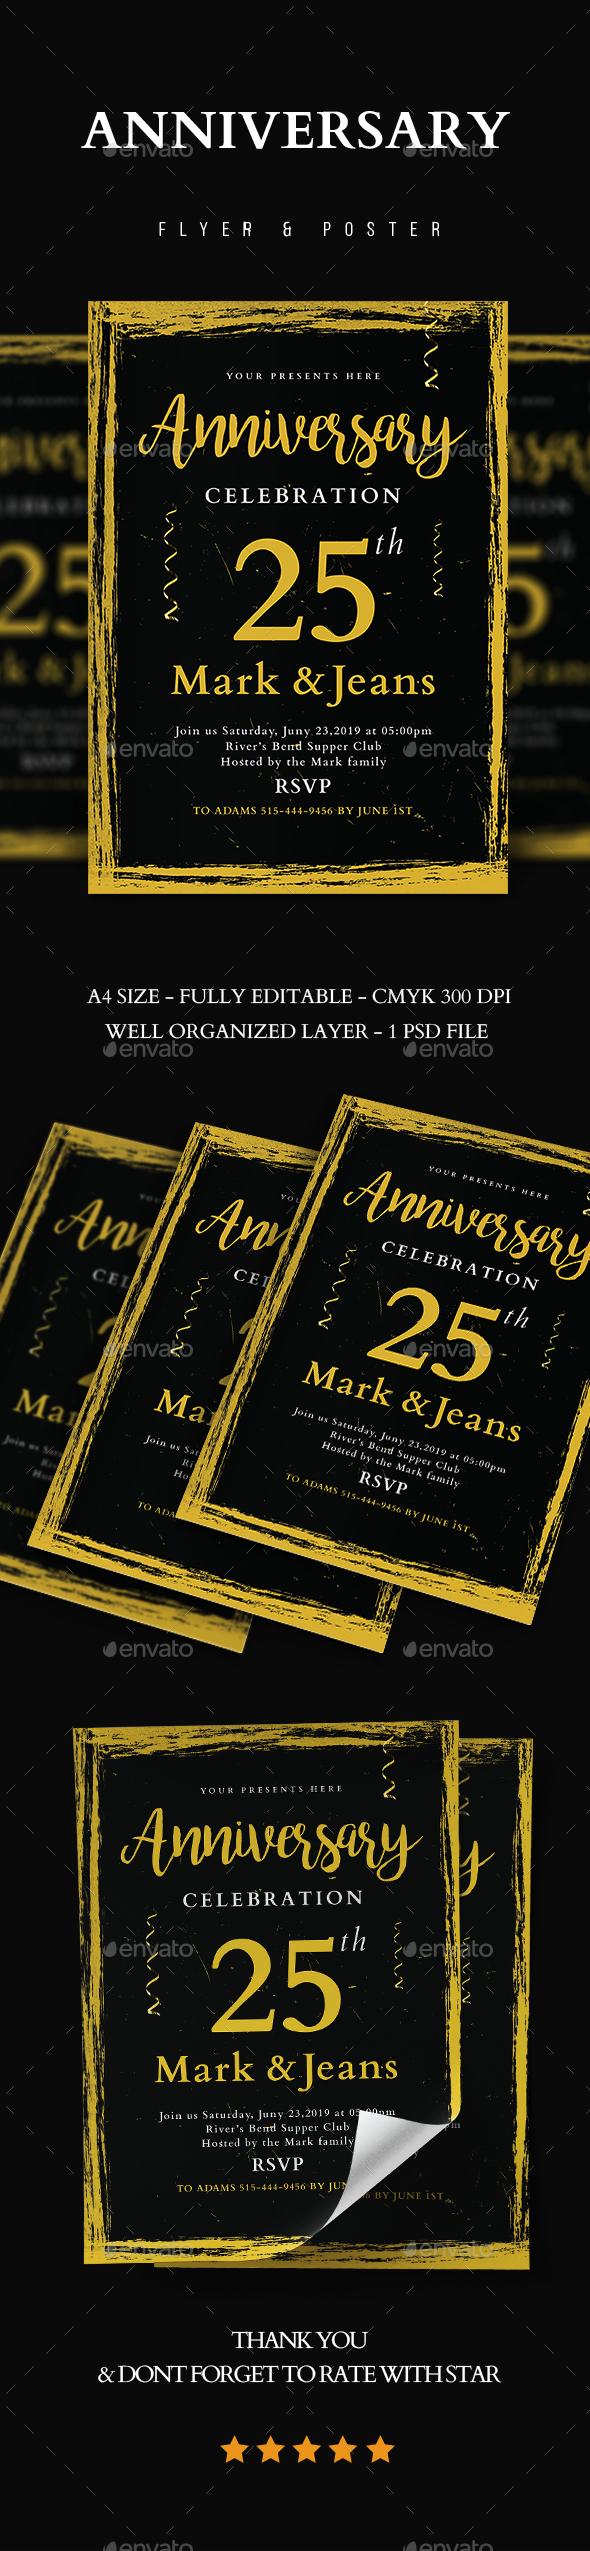 Anniversary Invitation Vol.3 - Flyers Print Templates